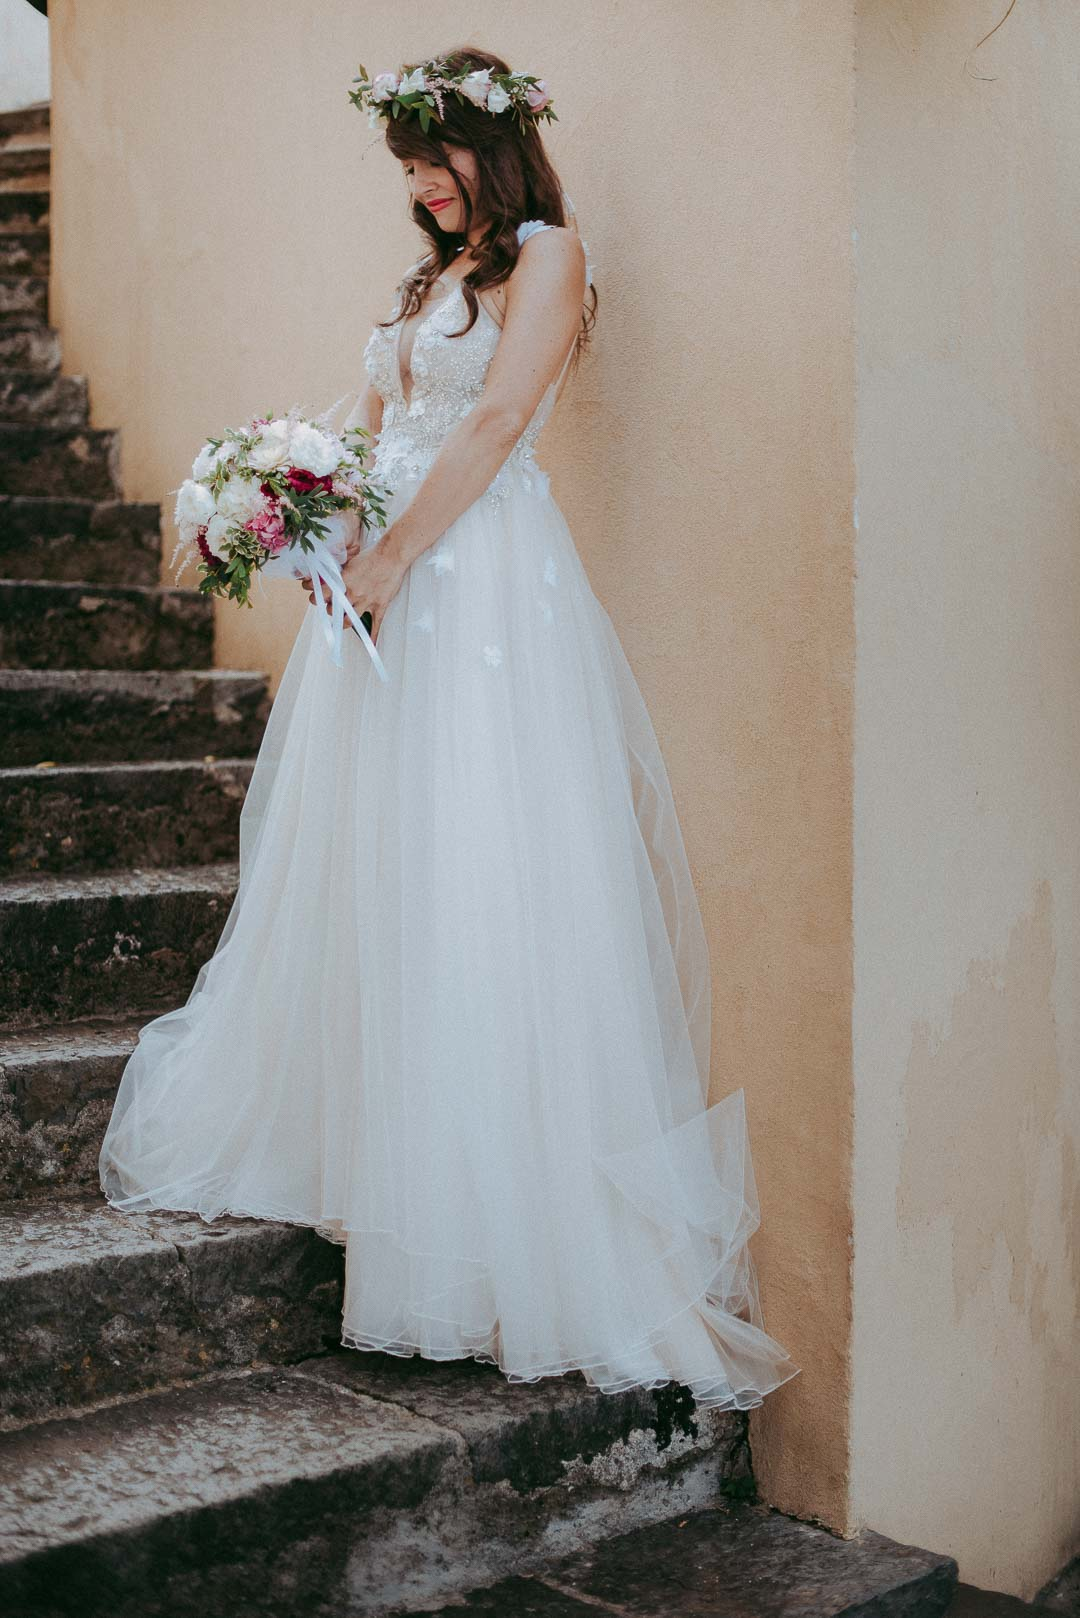 wedding-photographer-destination-fineart-bespoke-reportage-amalficoast-torrelacerniola-vivianeizzo-spazio46-47